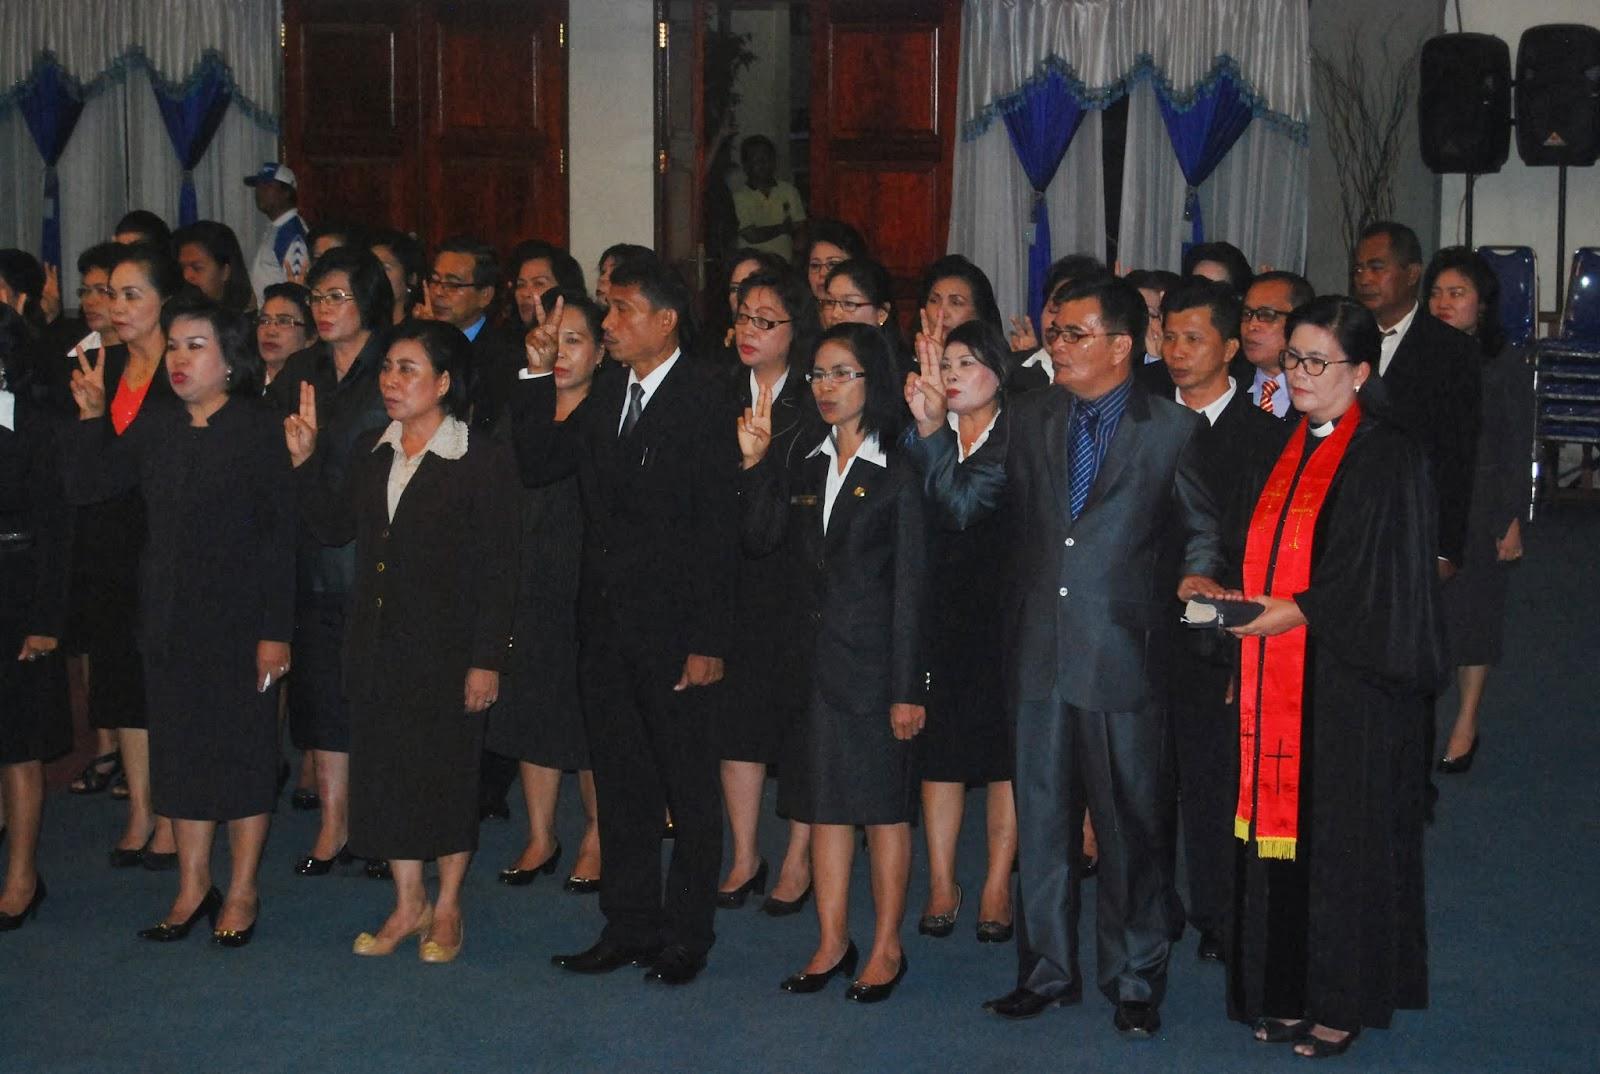 Humas Pemkot Manado 68 Kepala Sekolah Sd Smp Smk Resmi